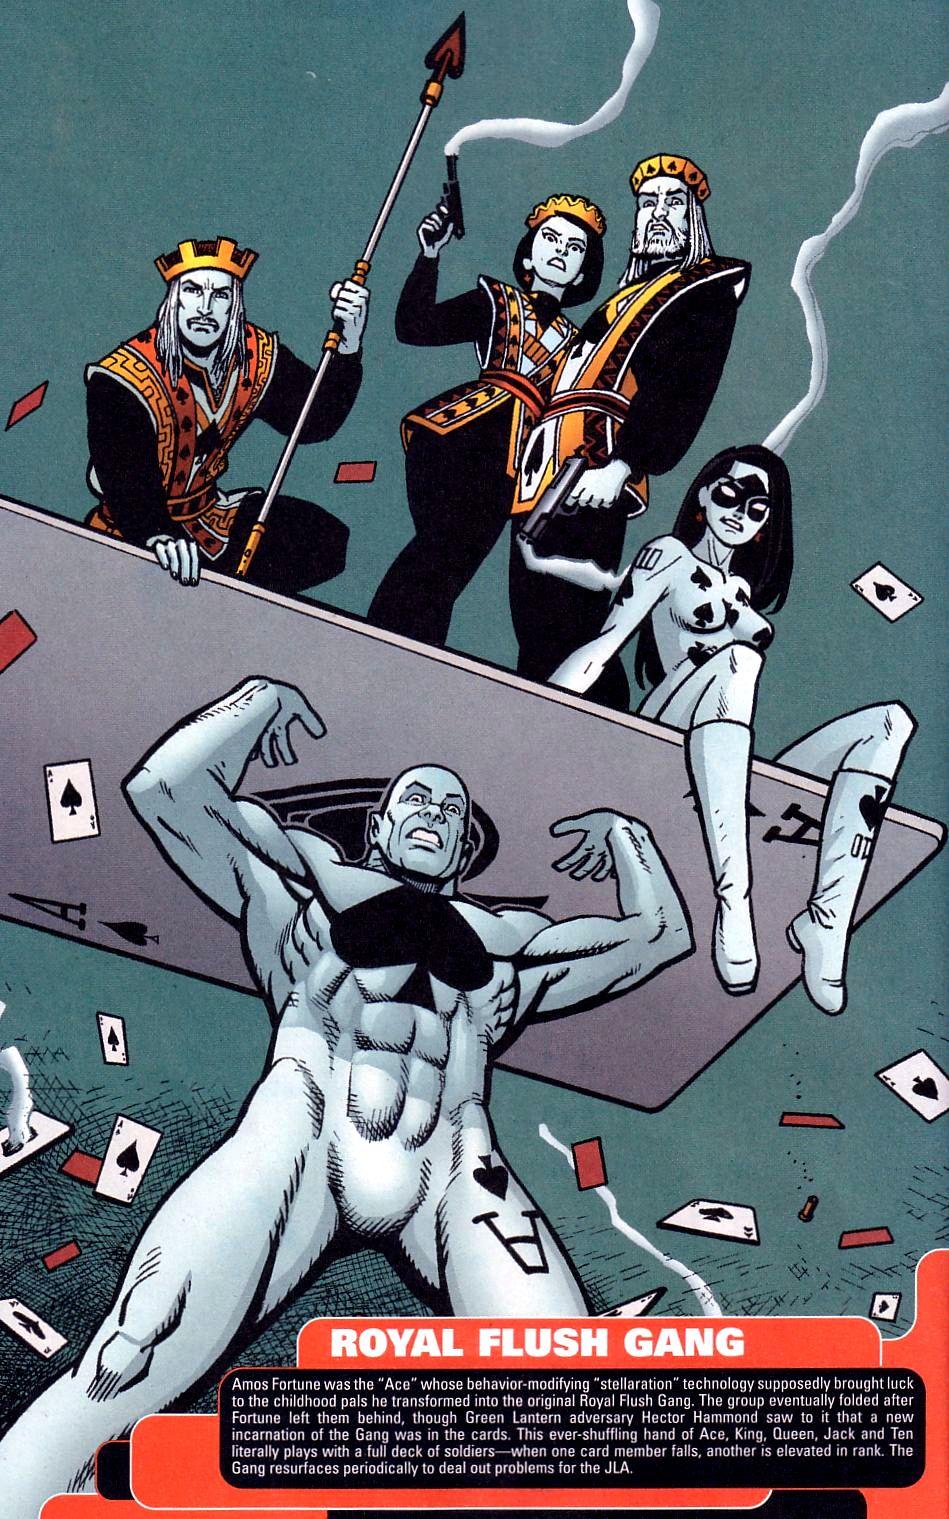 JLA: la Liga de la Justicia en cine - Página 2 Royal_Flush_Gang_004